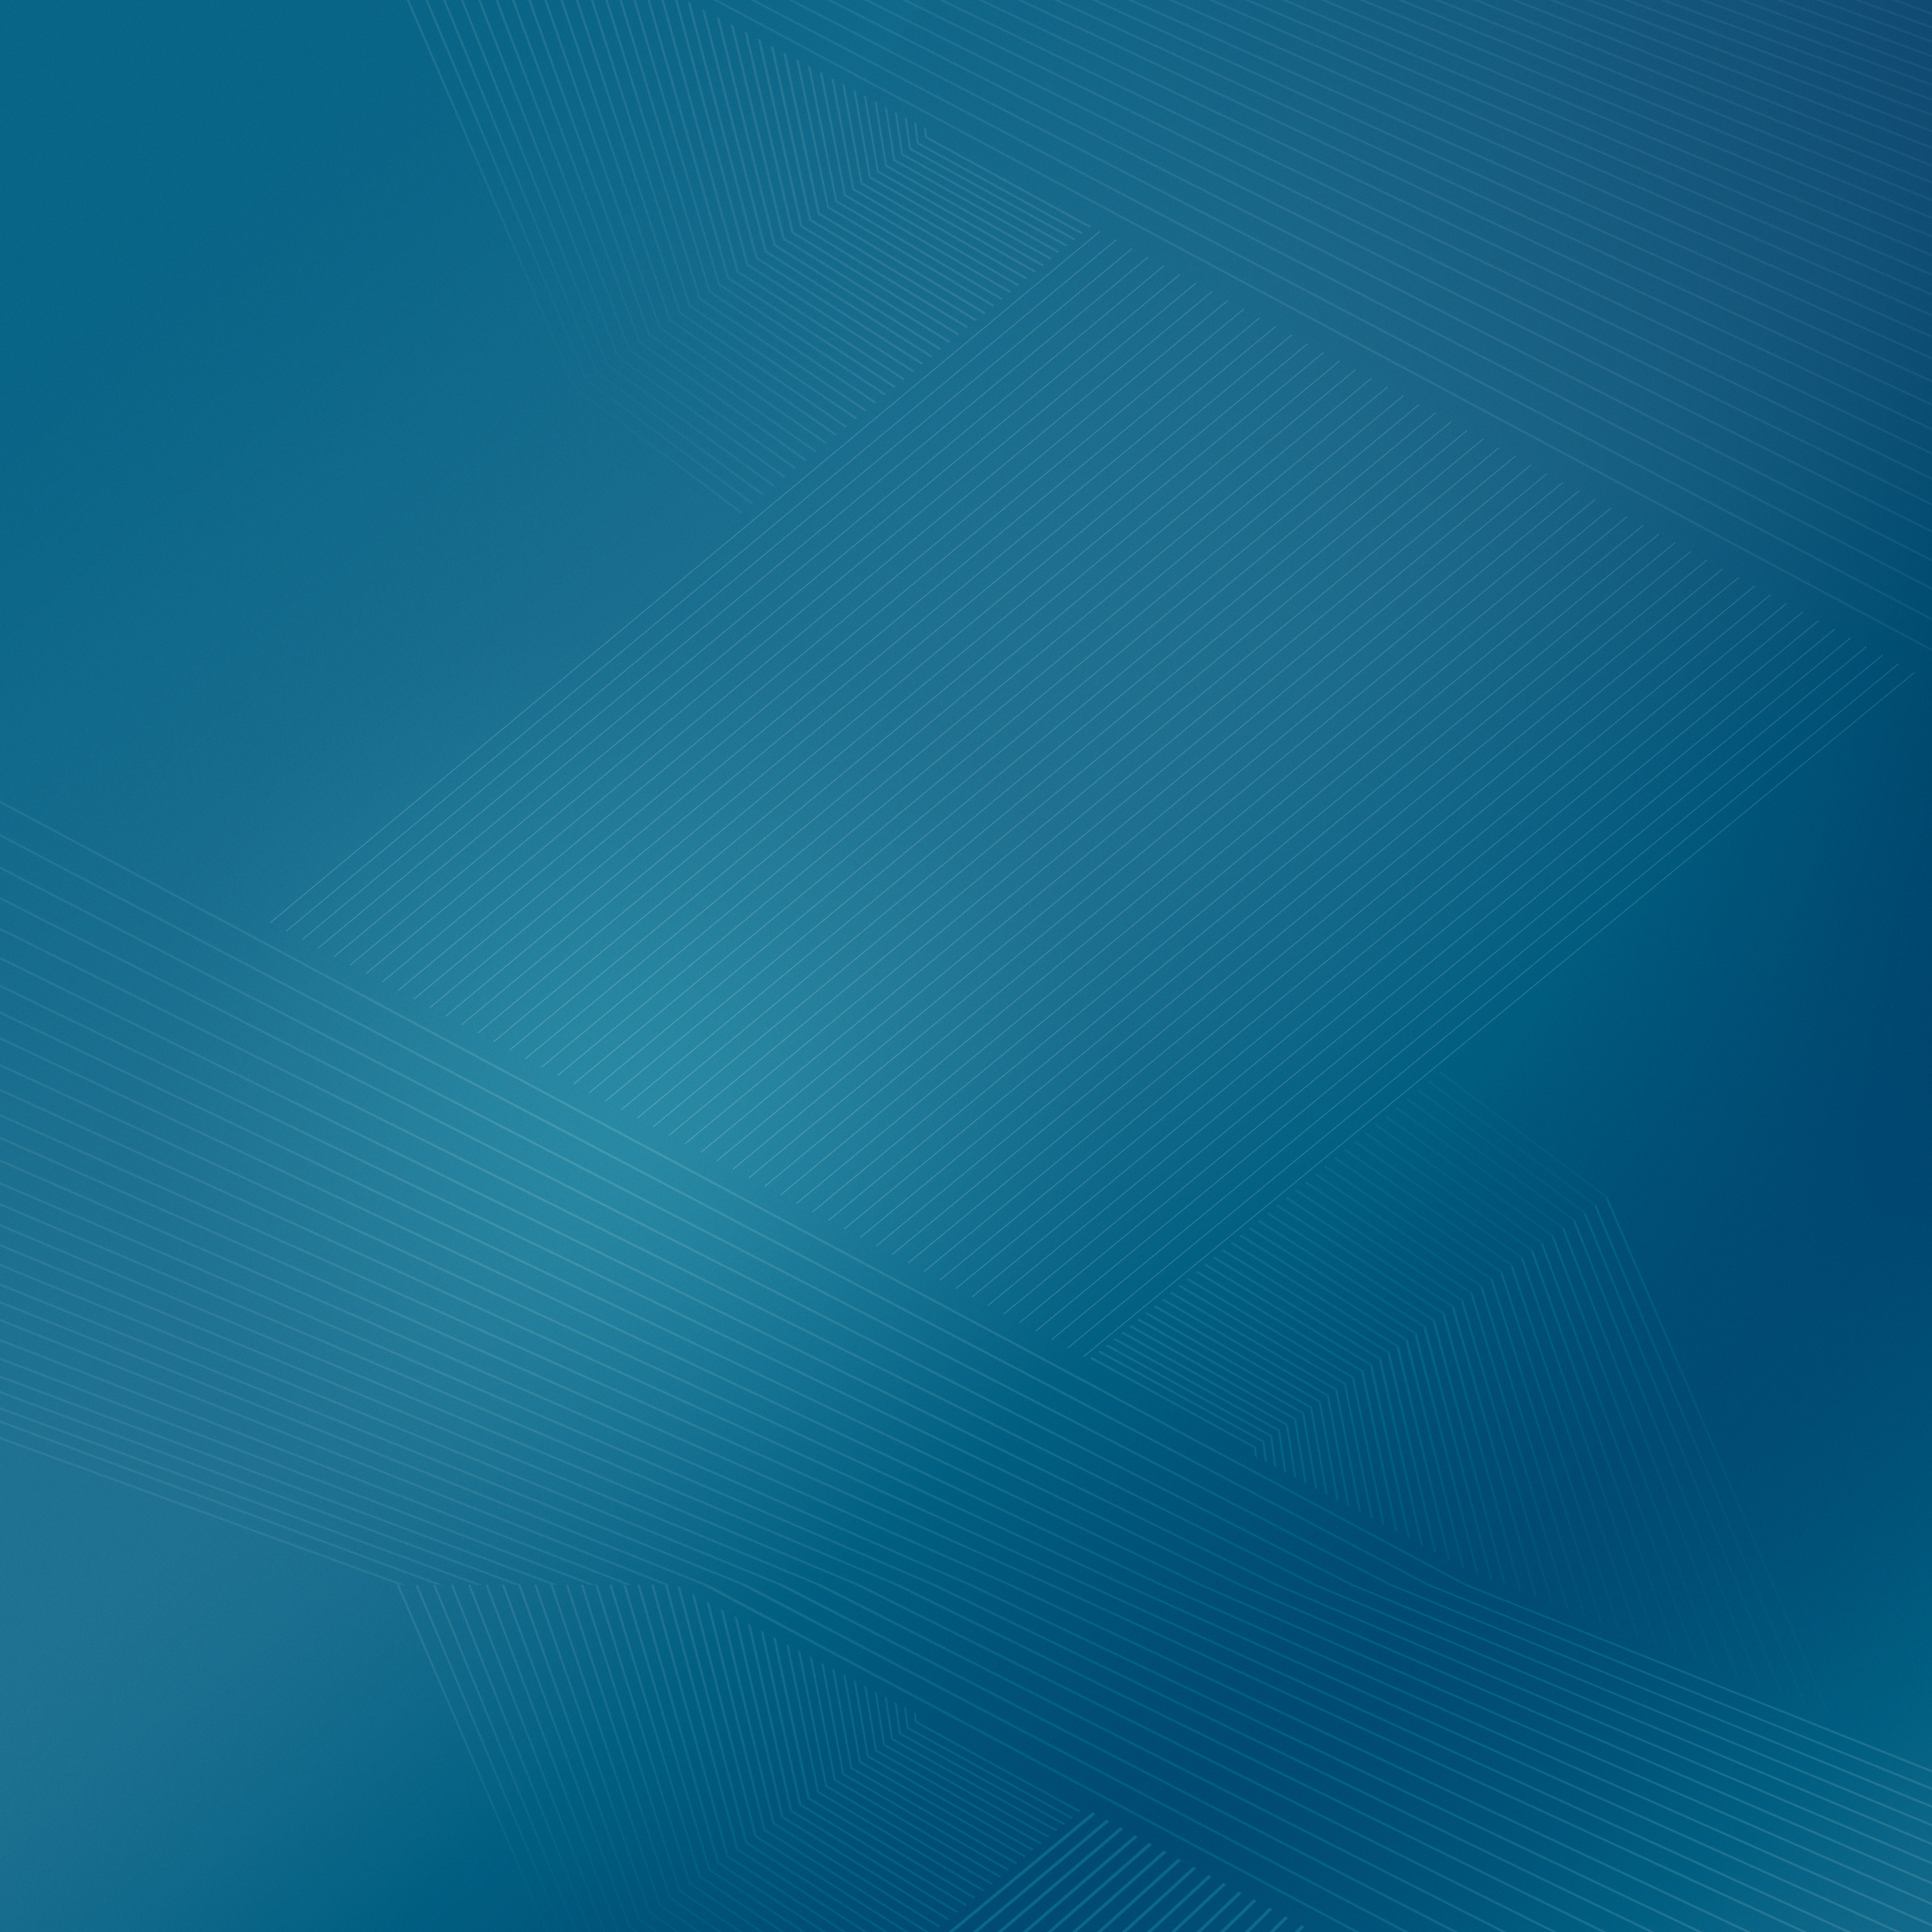 Download Samsung Galaxy S7 Wallpaper Sammobile